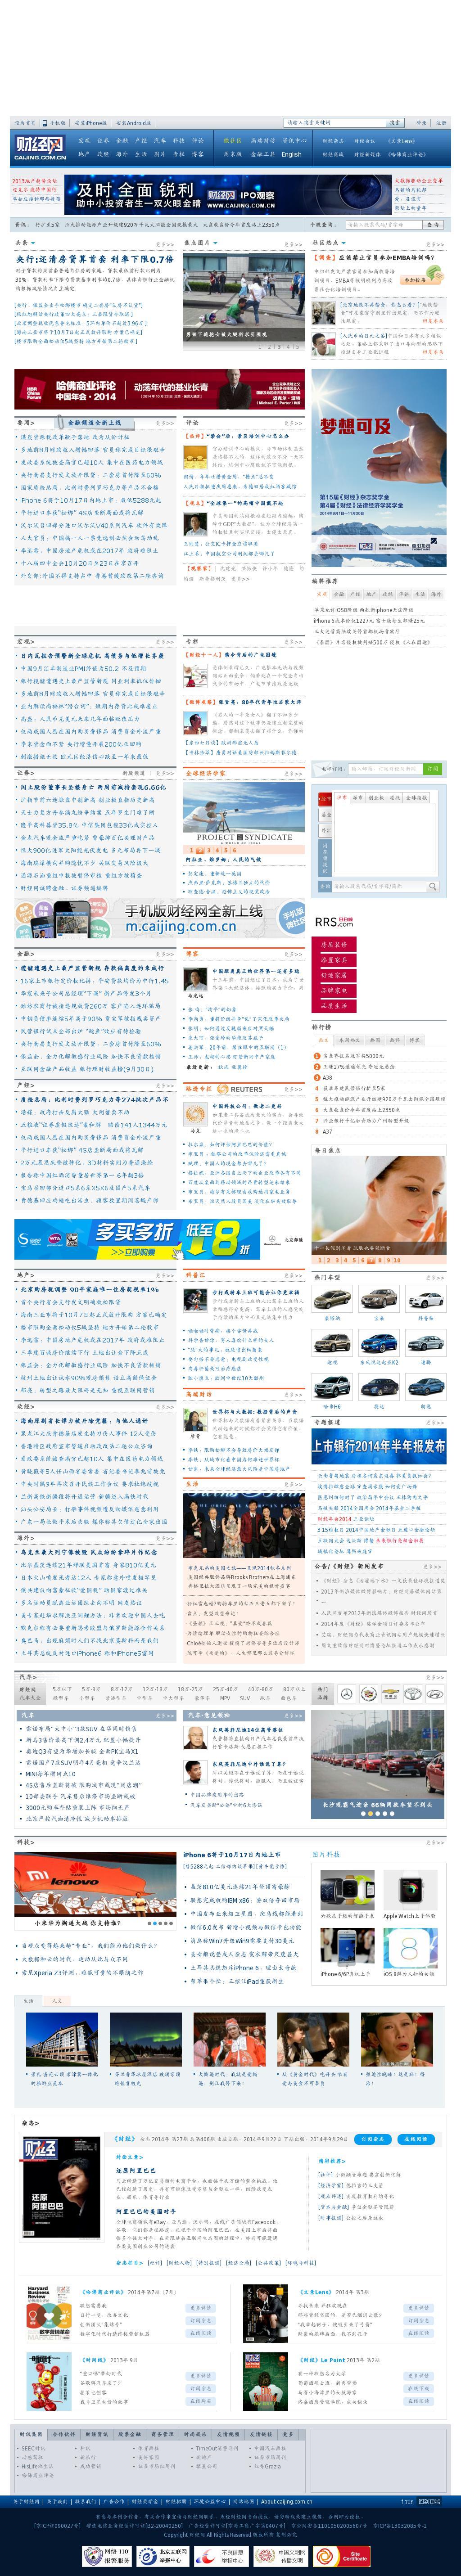 Caijing at Tuesday Sept. 30, 2014, 5:01 p.m. UTC